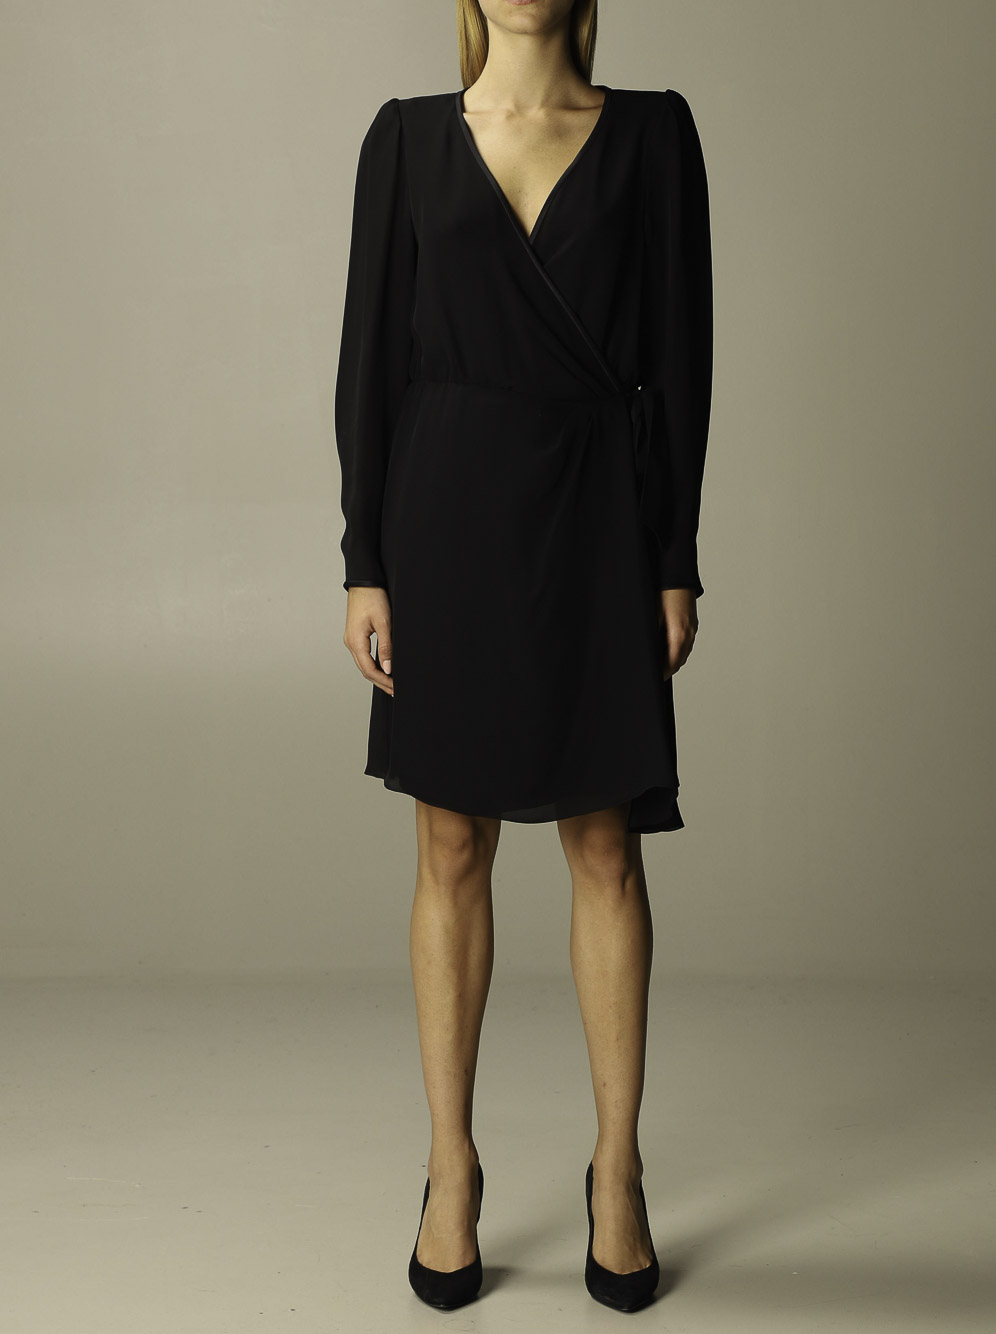 EMPORIO ARMANI Φόρεμα midi 9NA11T 92306-0999 ΜΑΥΡΟ